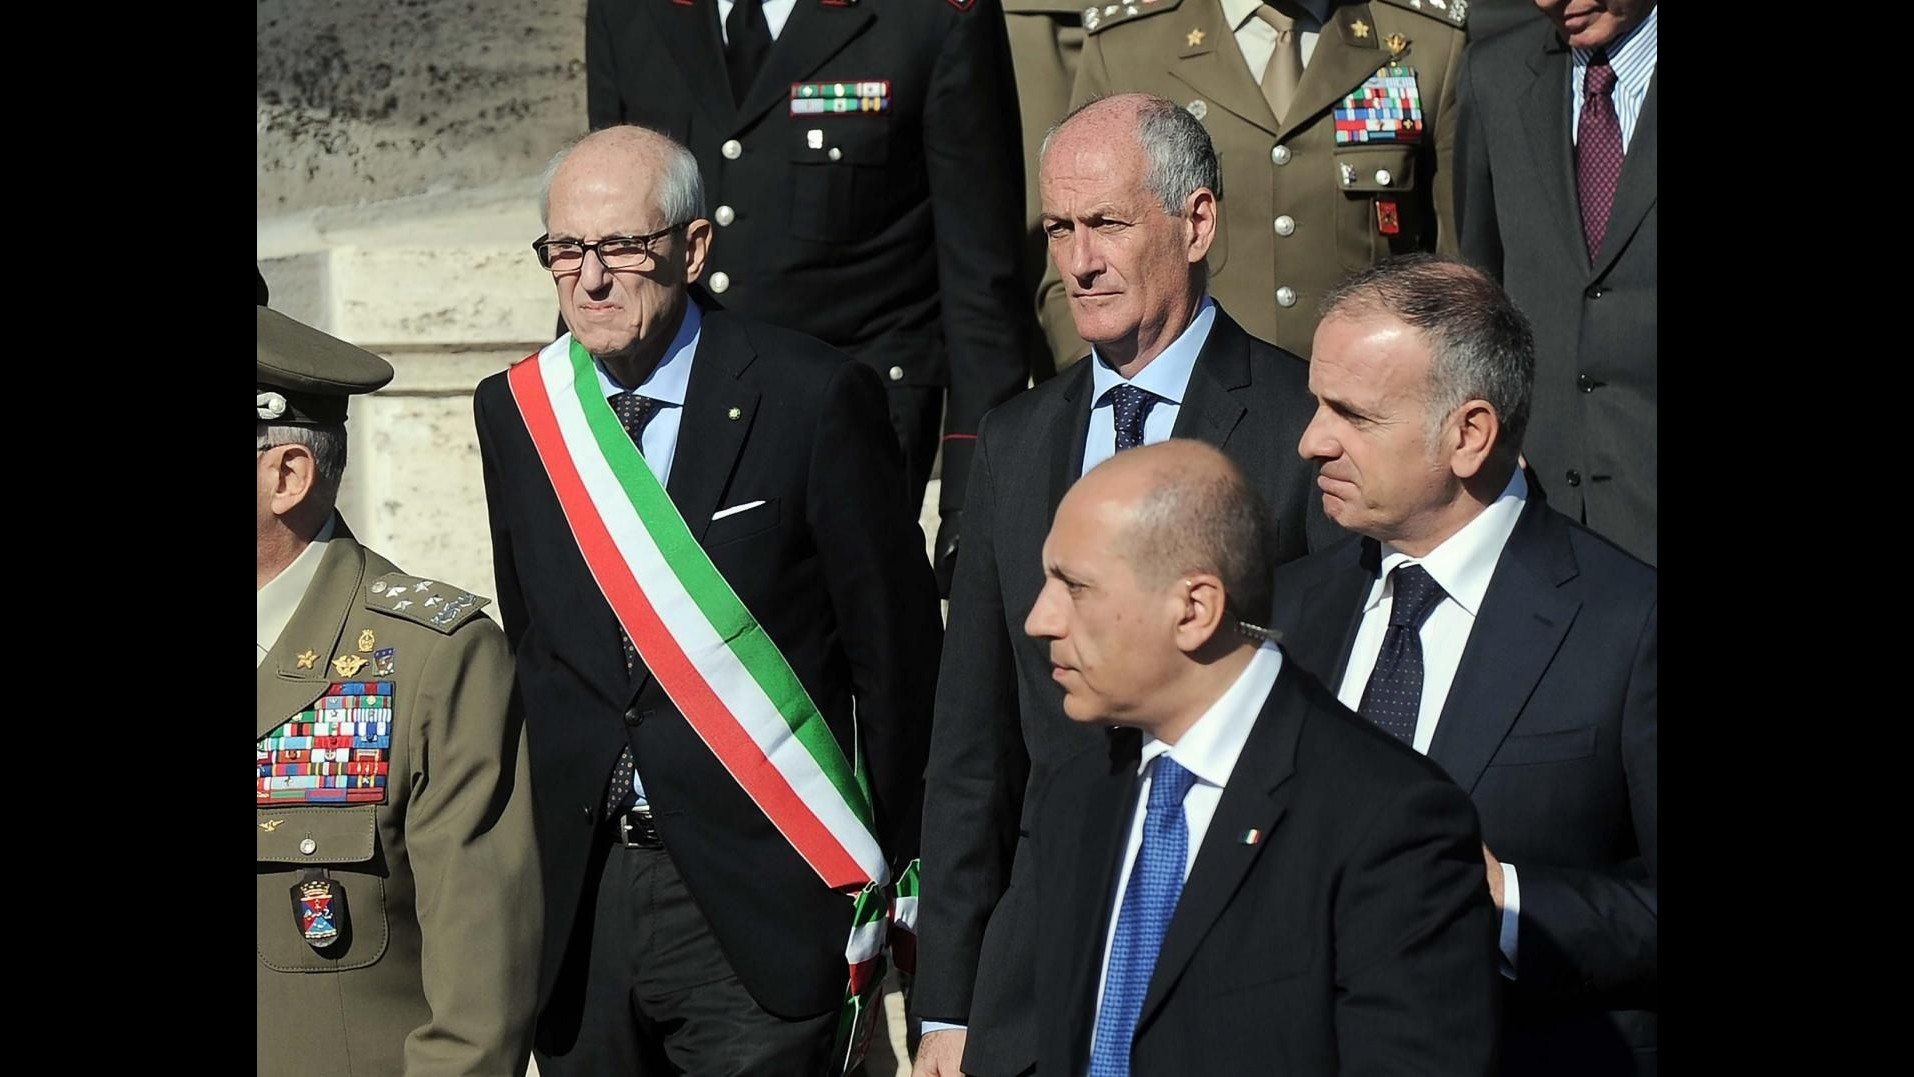 Roma, Tronca: Annullare gara festa Befana in Piazza Navona